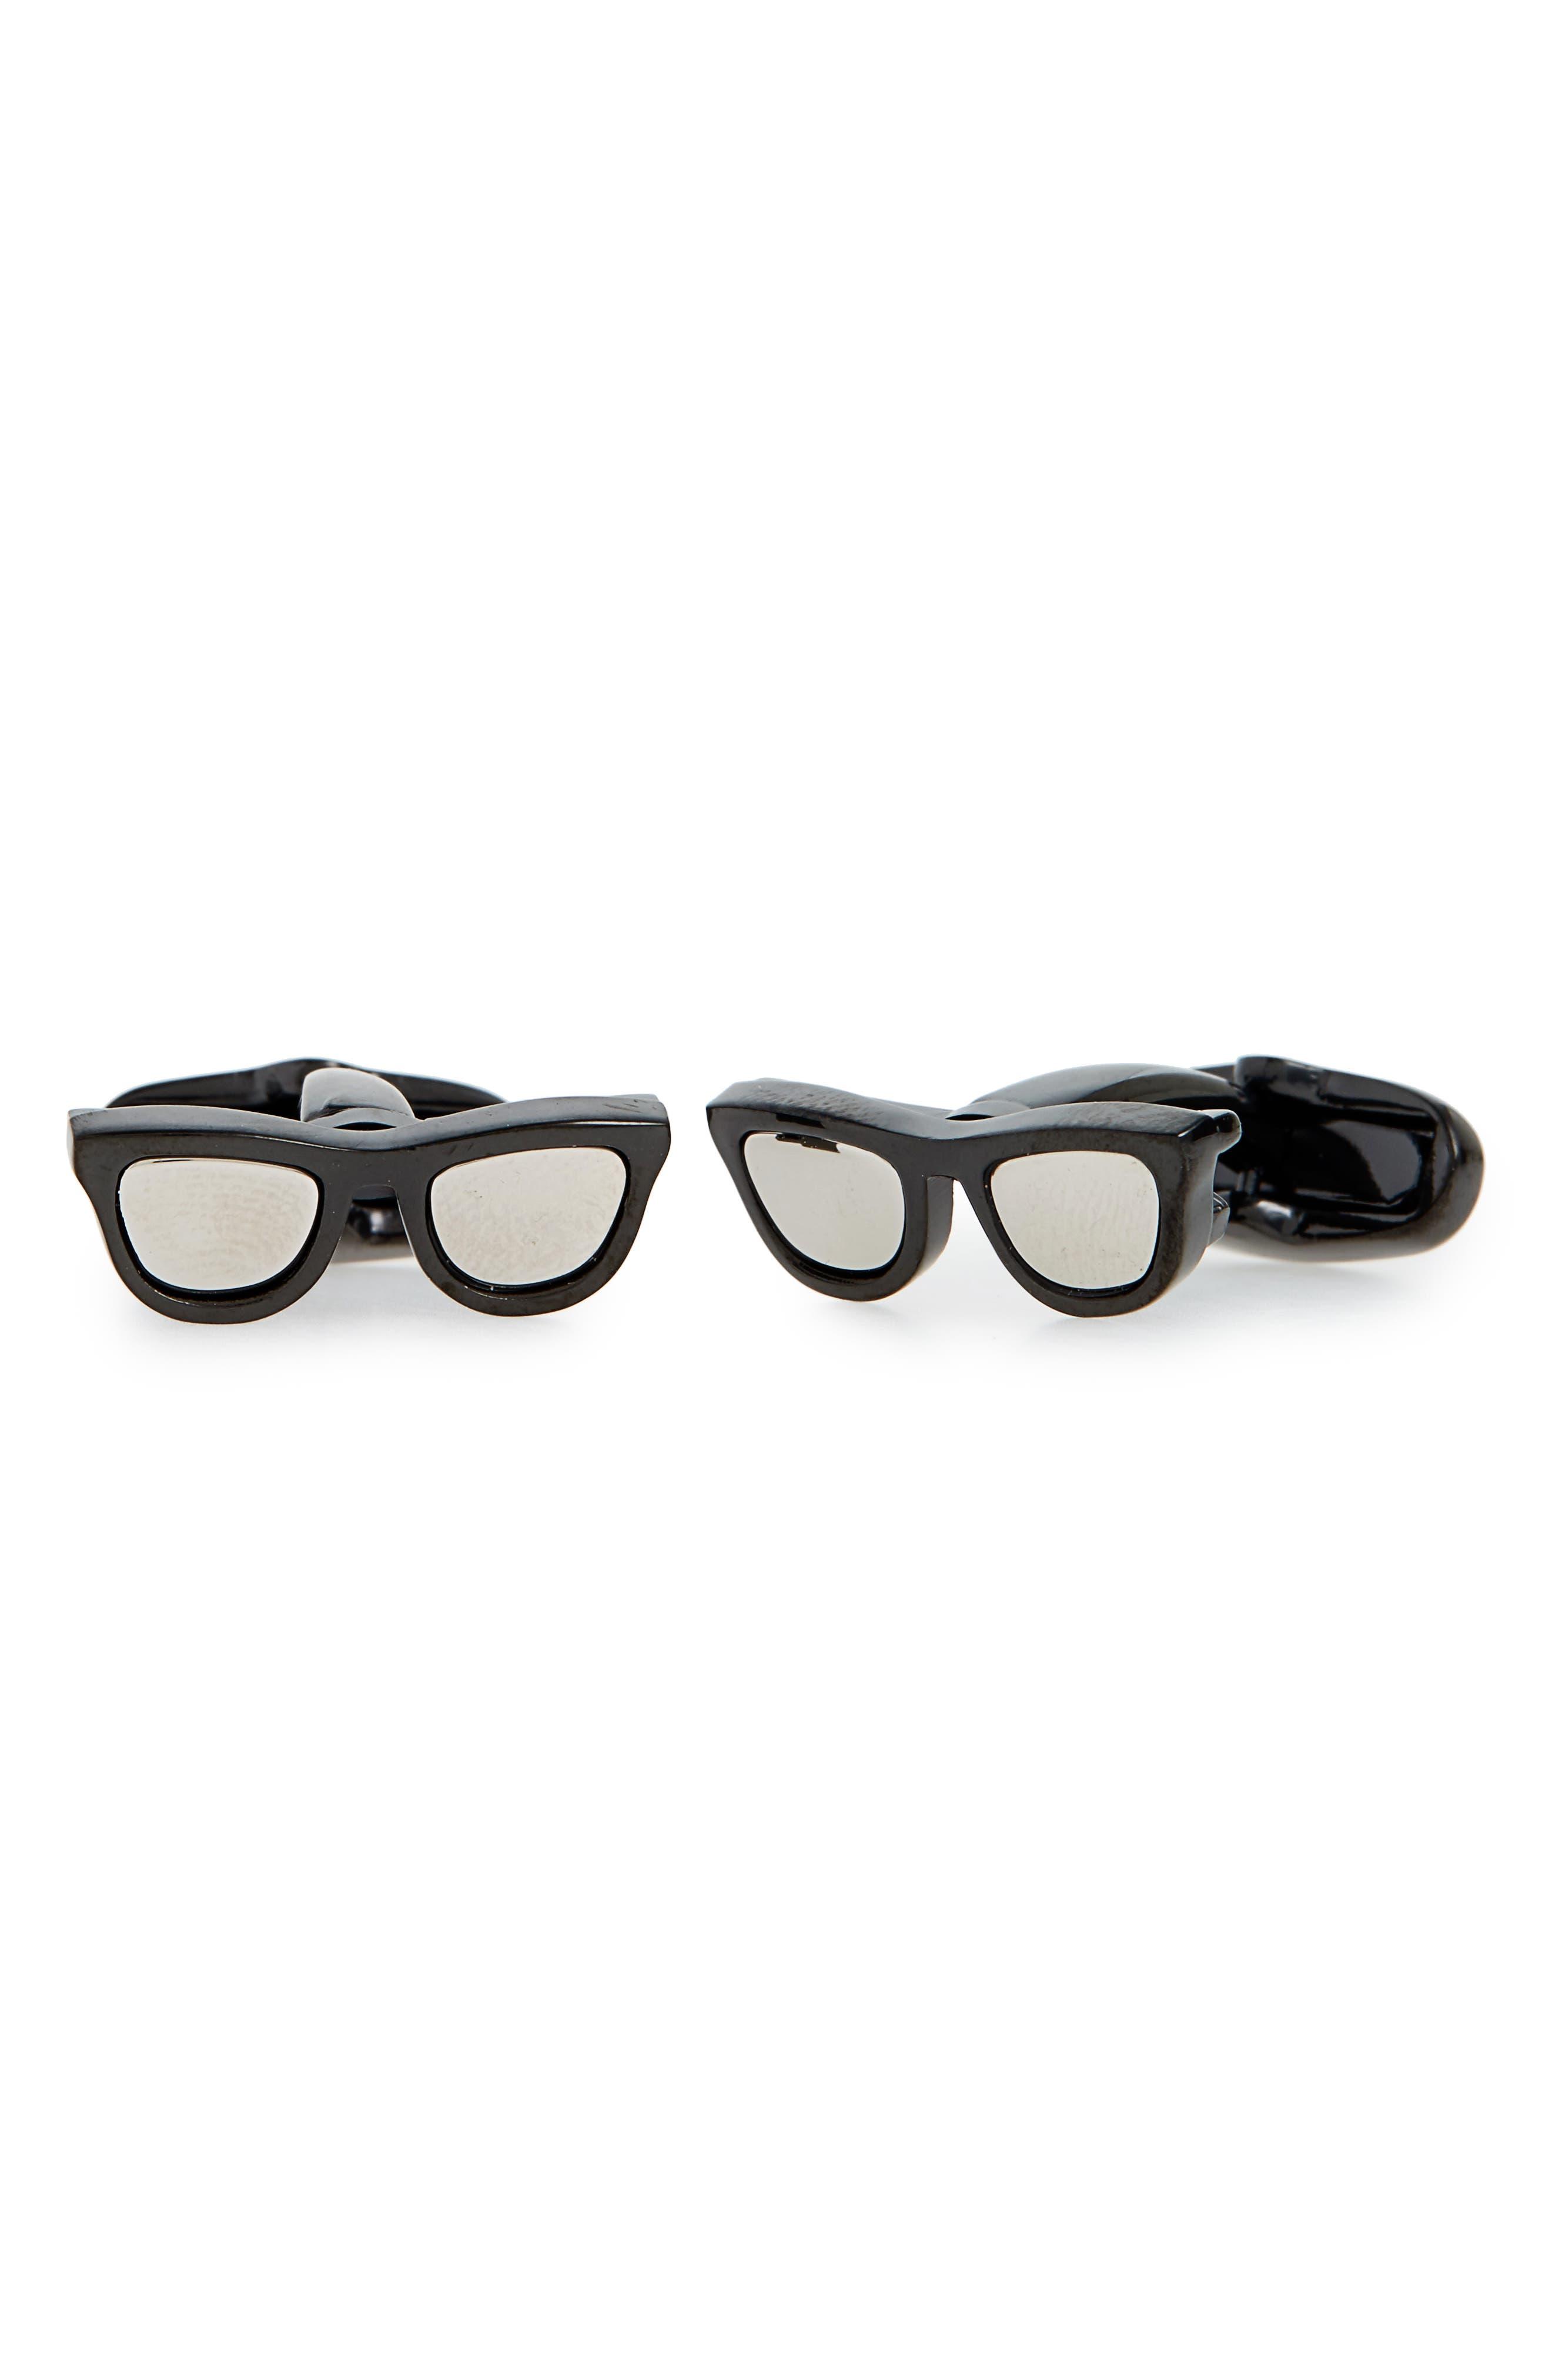 Paul Smith Sunglasses Cuff Links